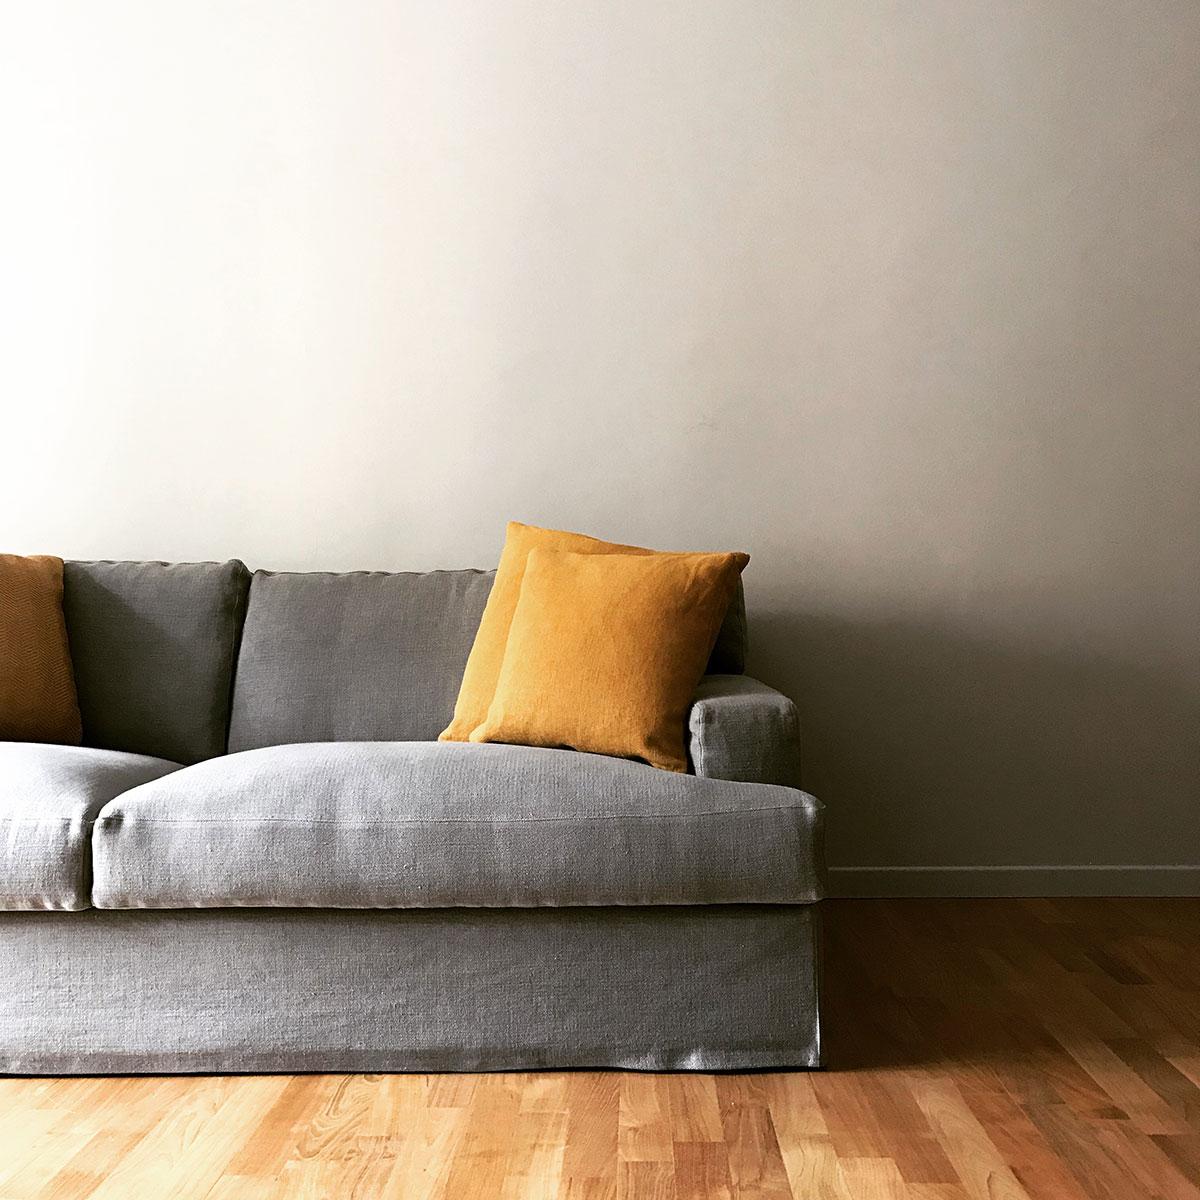 kickoffice casa cb livingroom couch sofa paquet